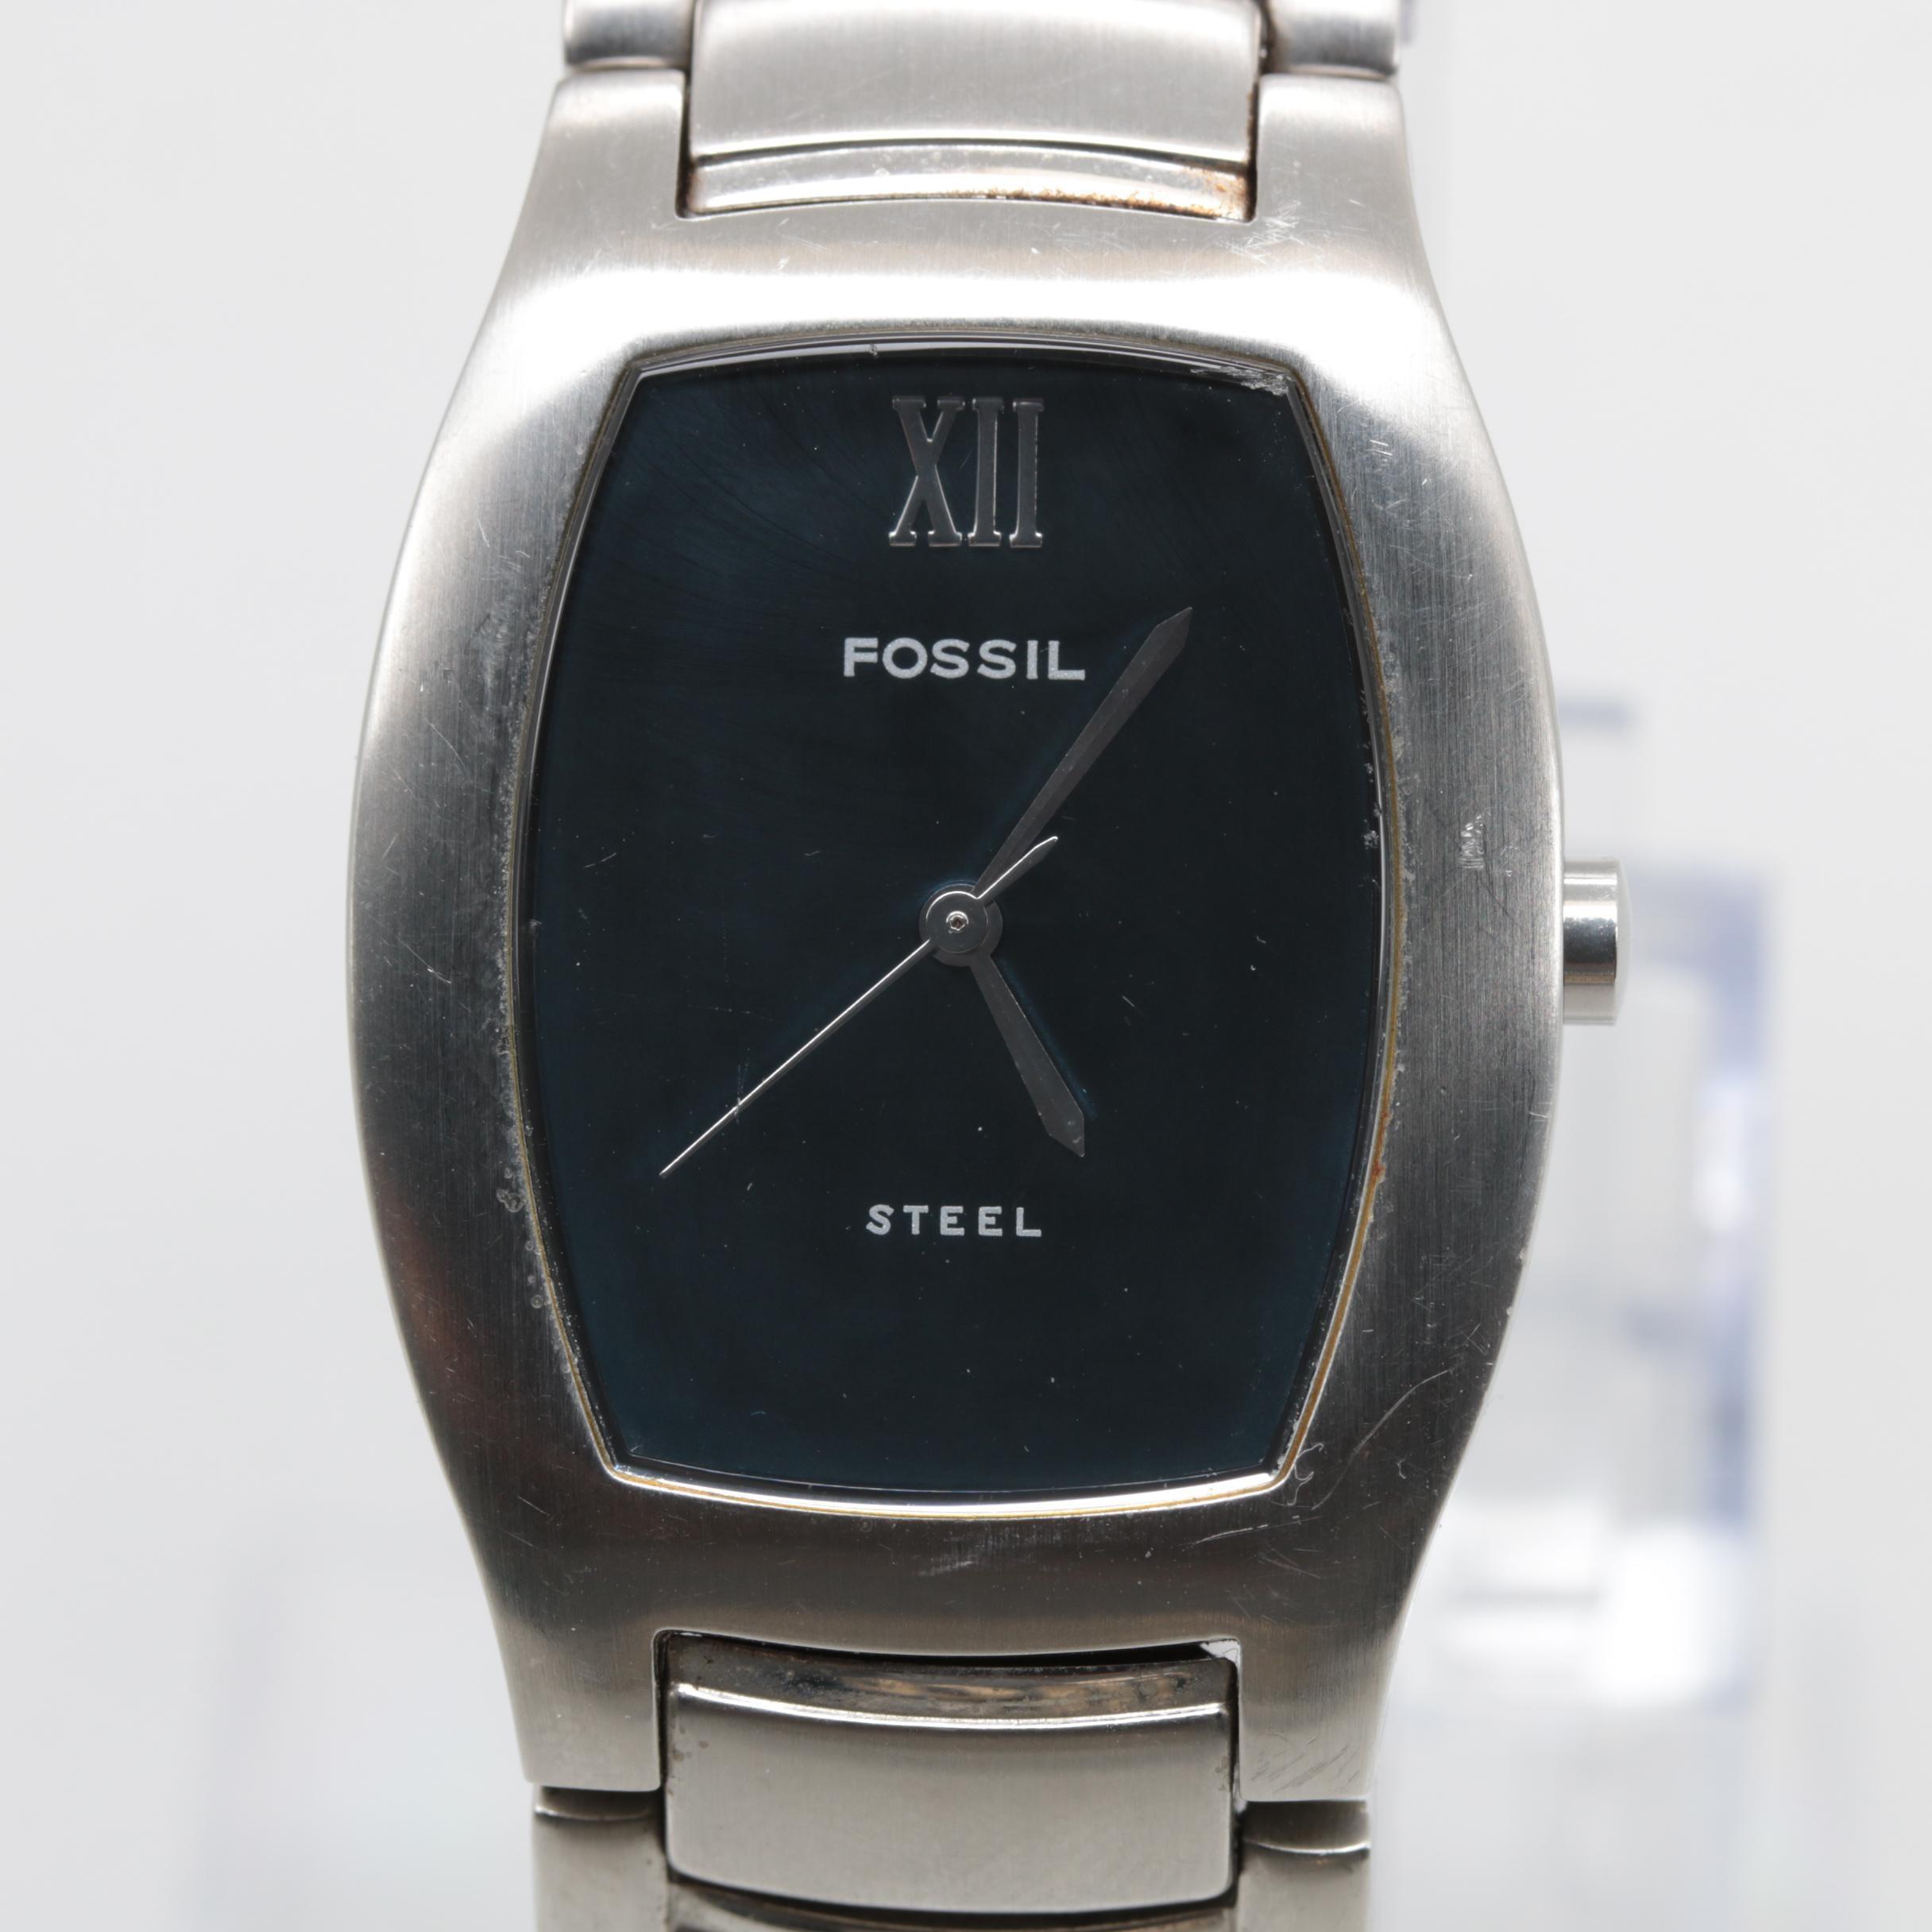 Fossil Stainless Steel Model FS-2738 Quartz Wristwatch